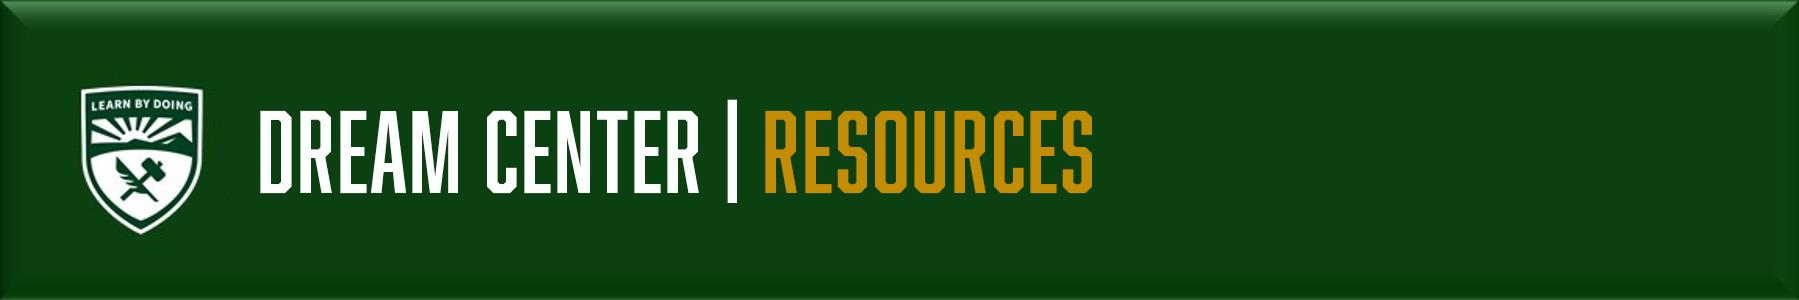 Dream Center - Resources